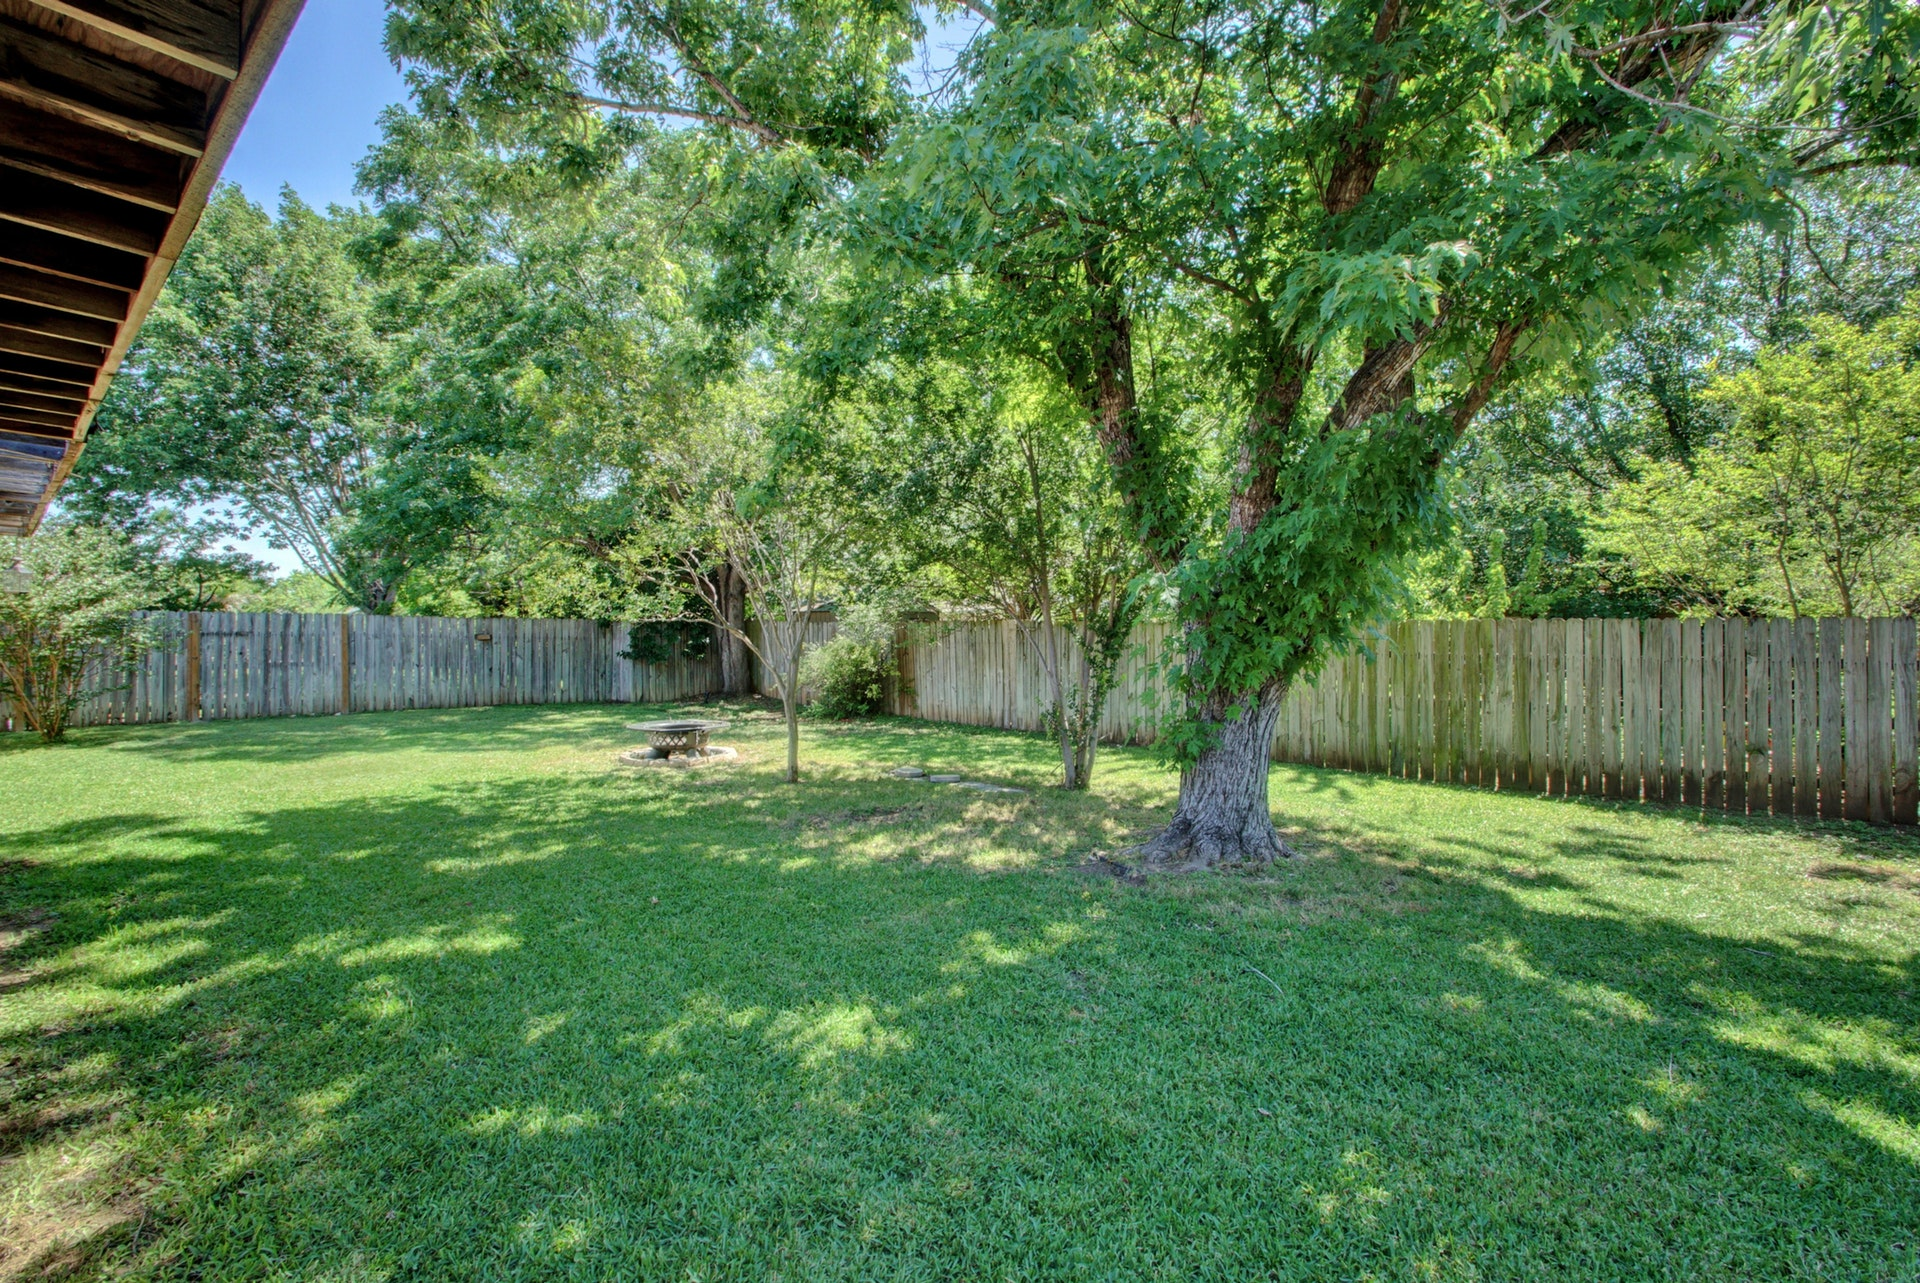 209 Hickok - Backyard 2